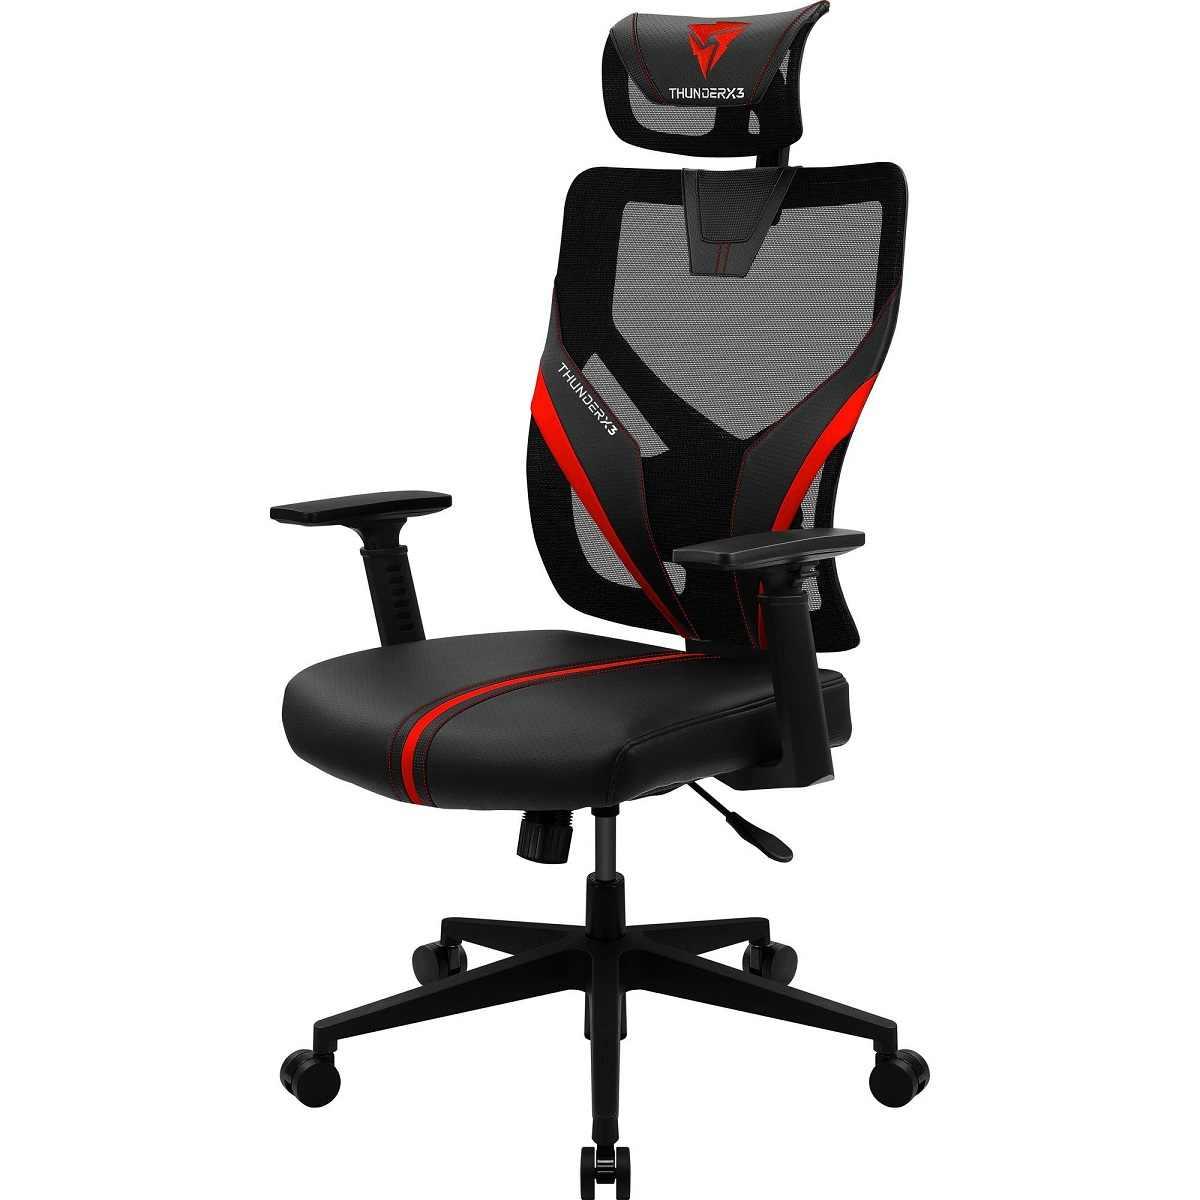 Cadeira Gamer Ergonômica Yama1 Thunderx3